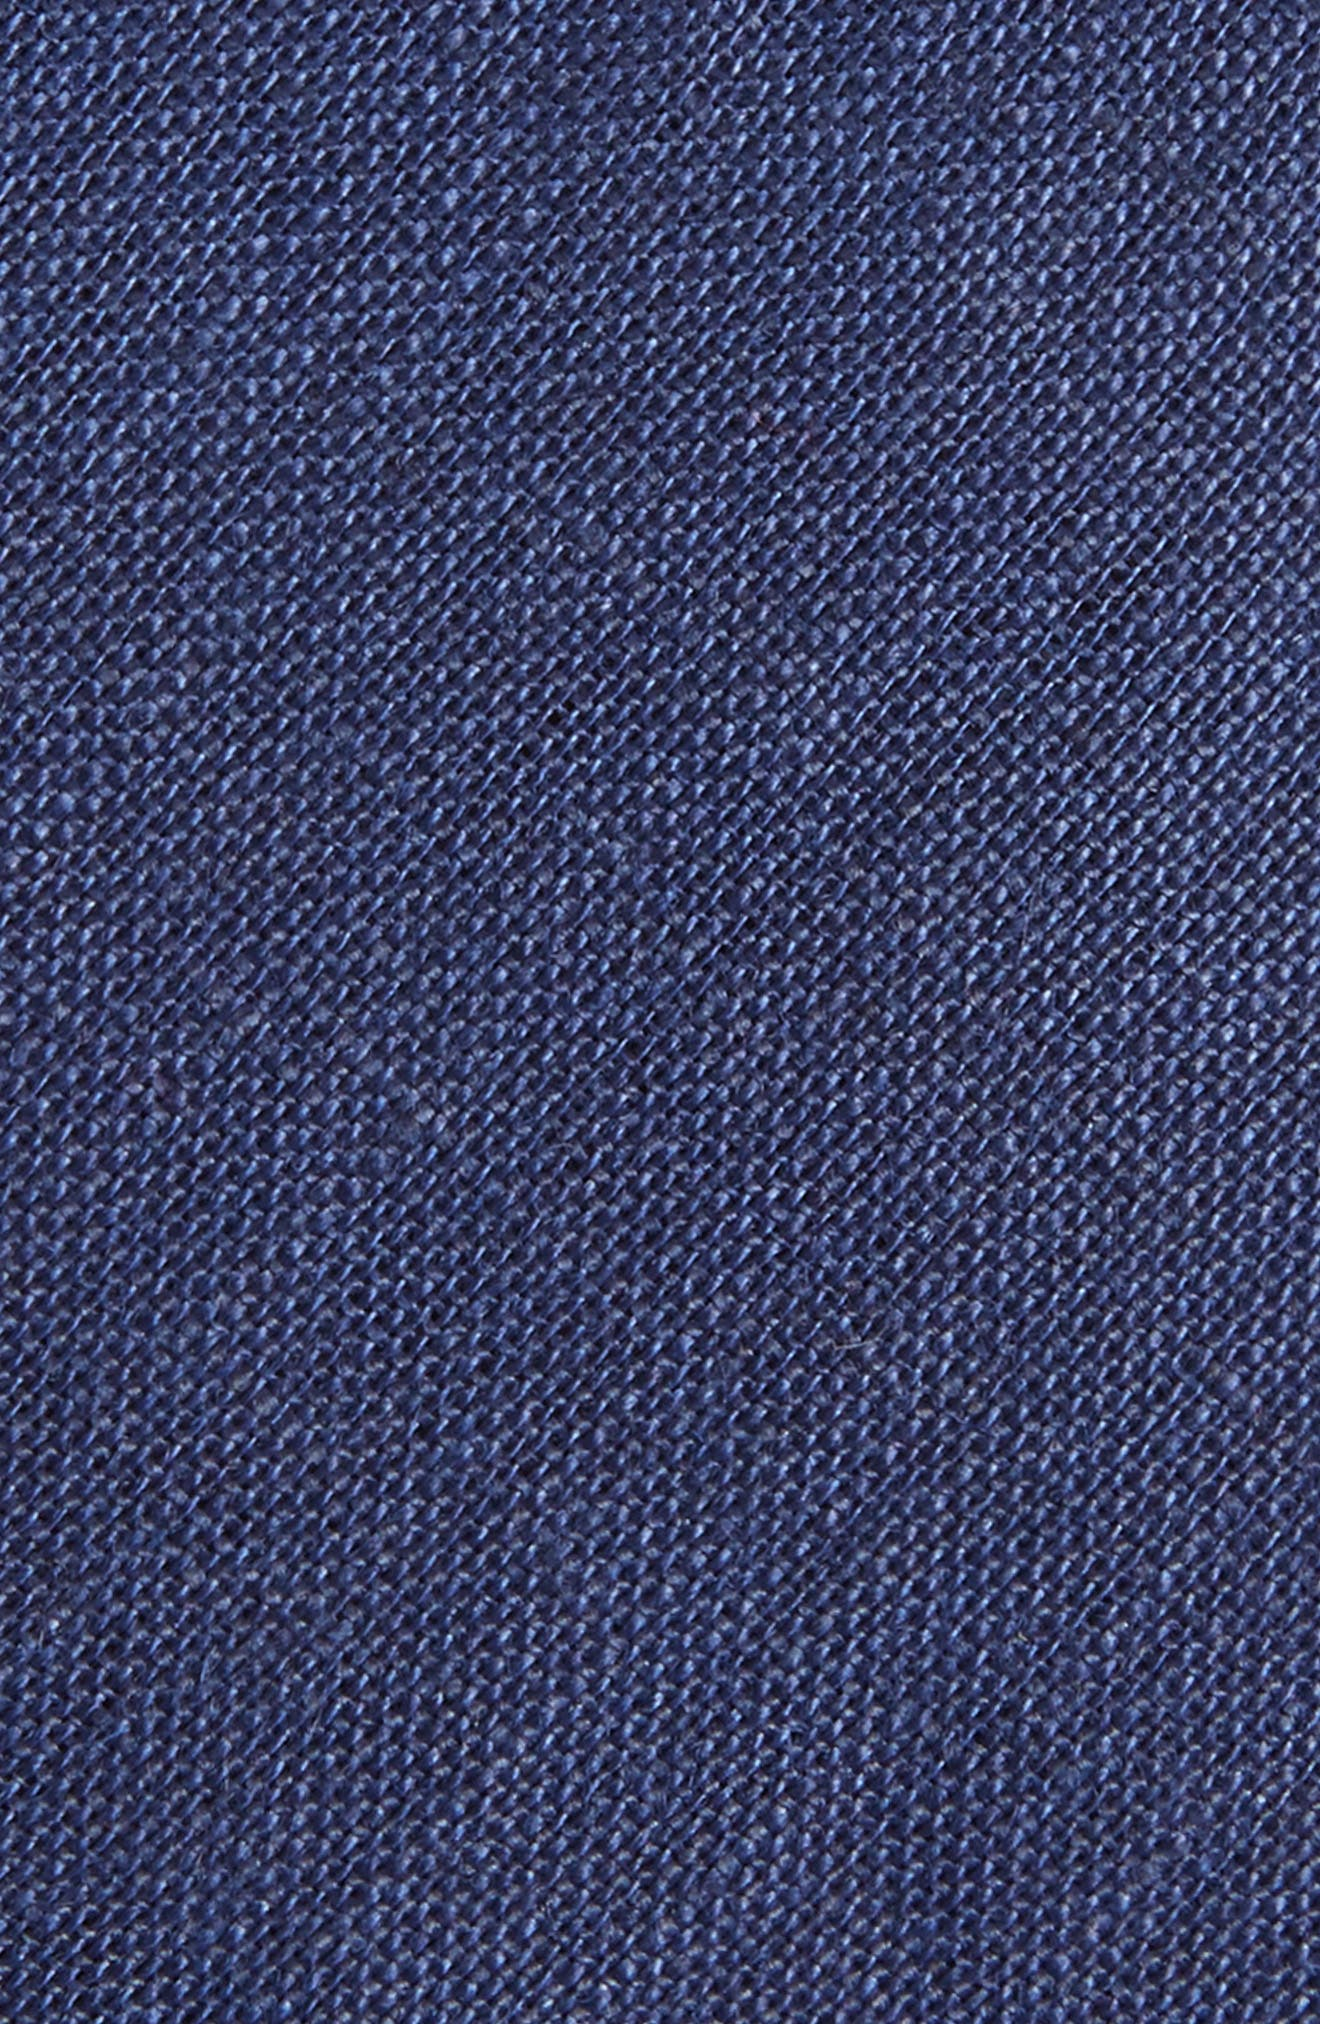 Solid Linen Tie,                             Alternate thumbnail 2, color,                             Solid Linen